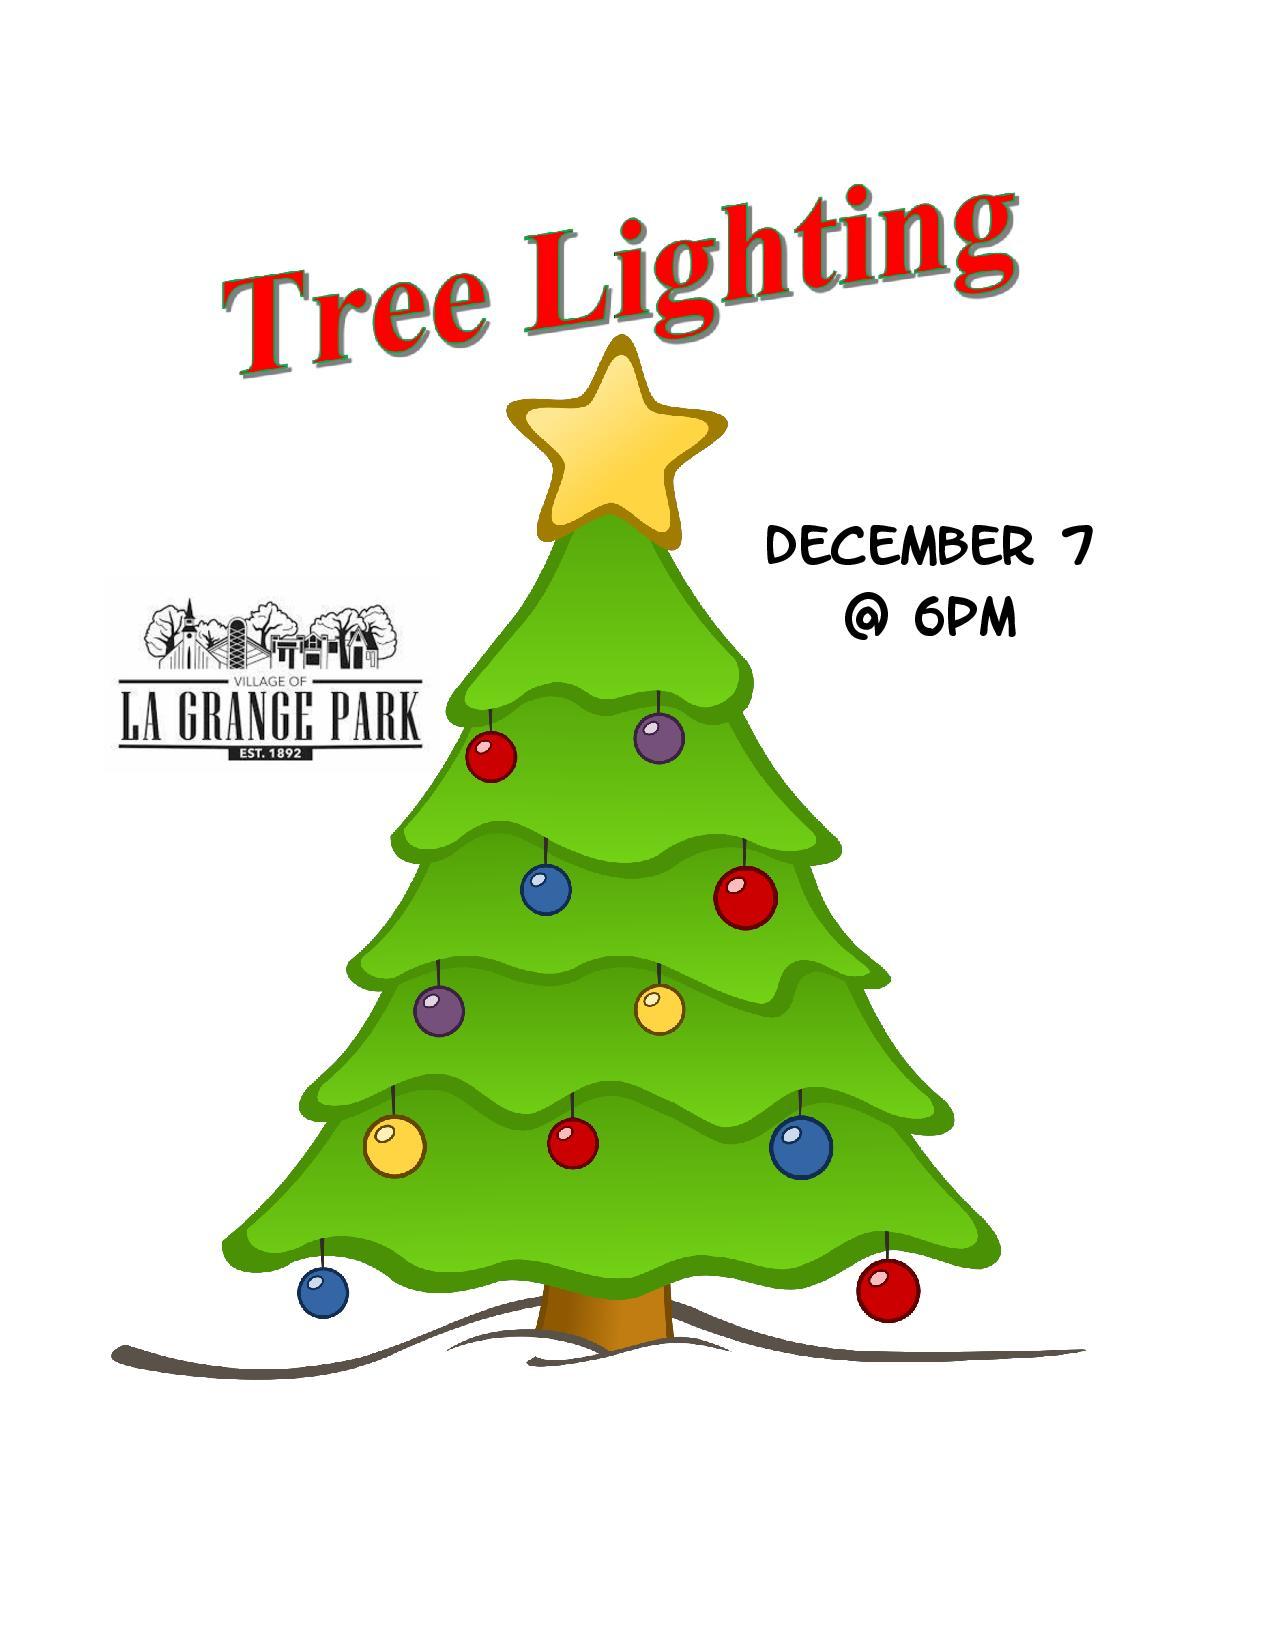 tree-lighting-image-page-001.jpg